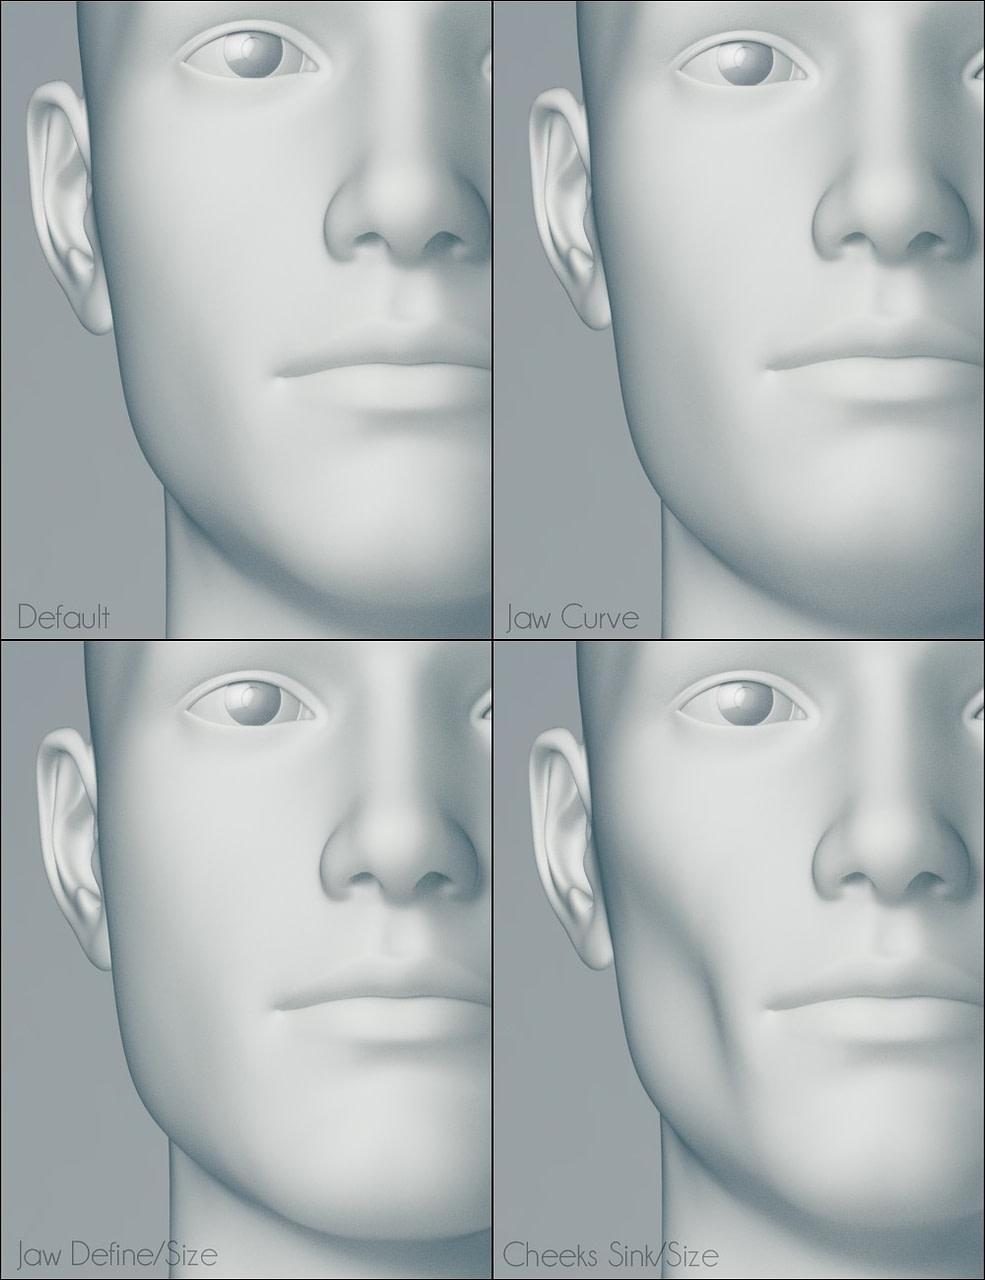 daz genesis 3 male head morphs